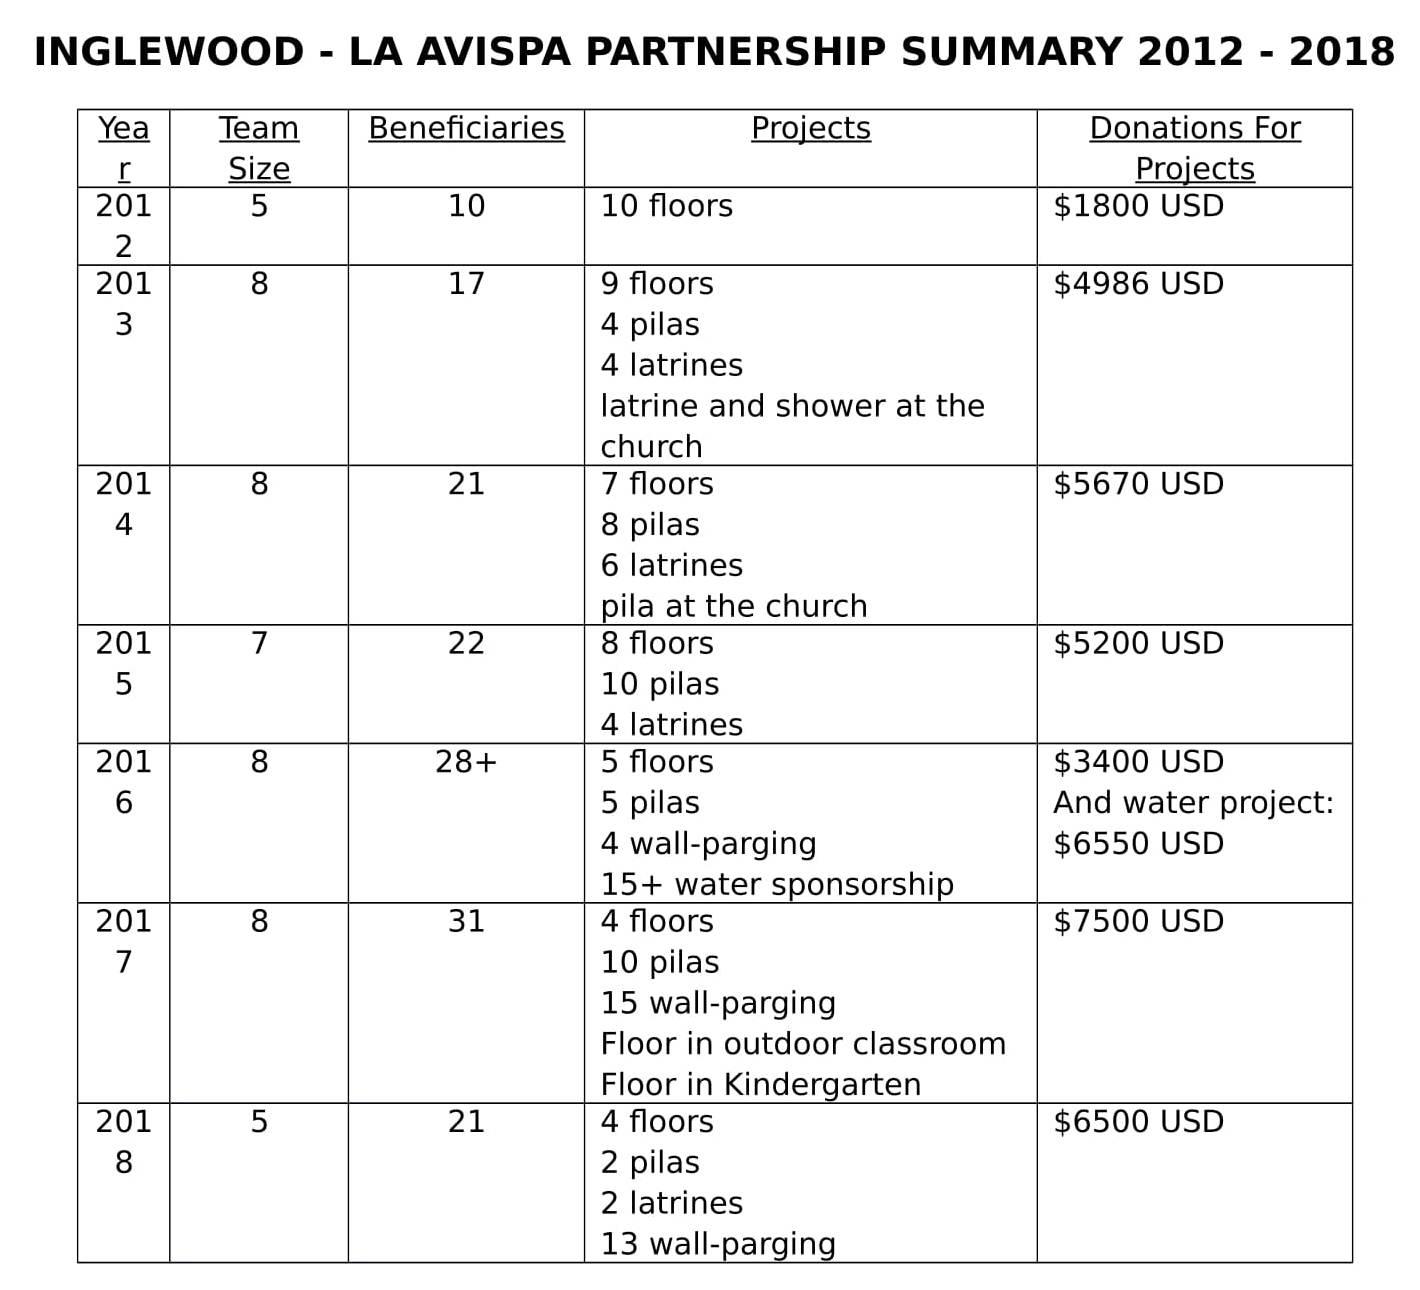 LaAvispa Partnership Summary.jpg